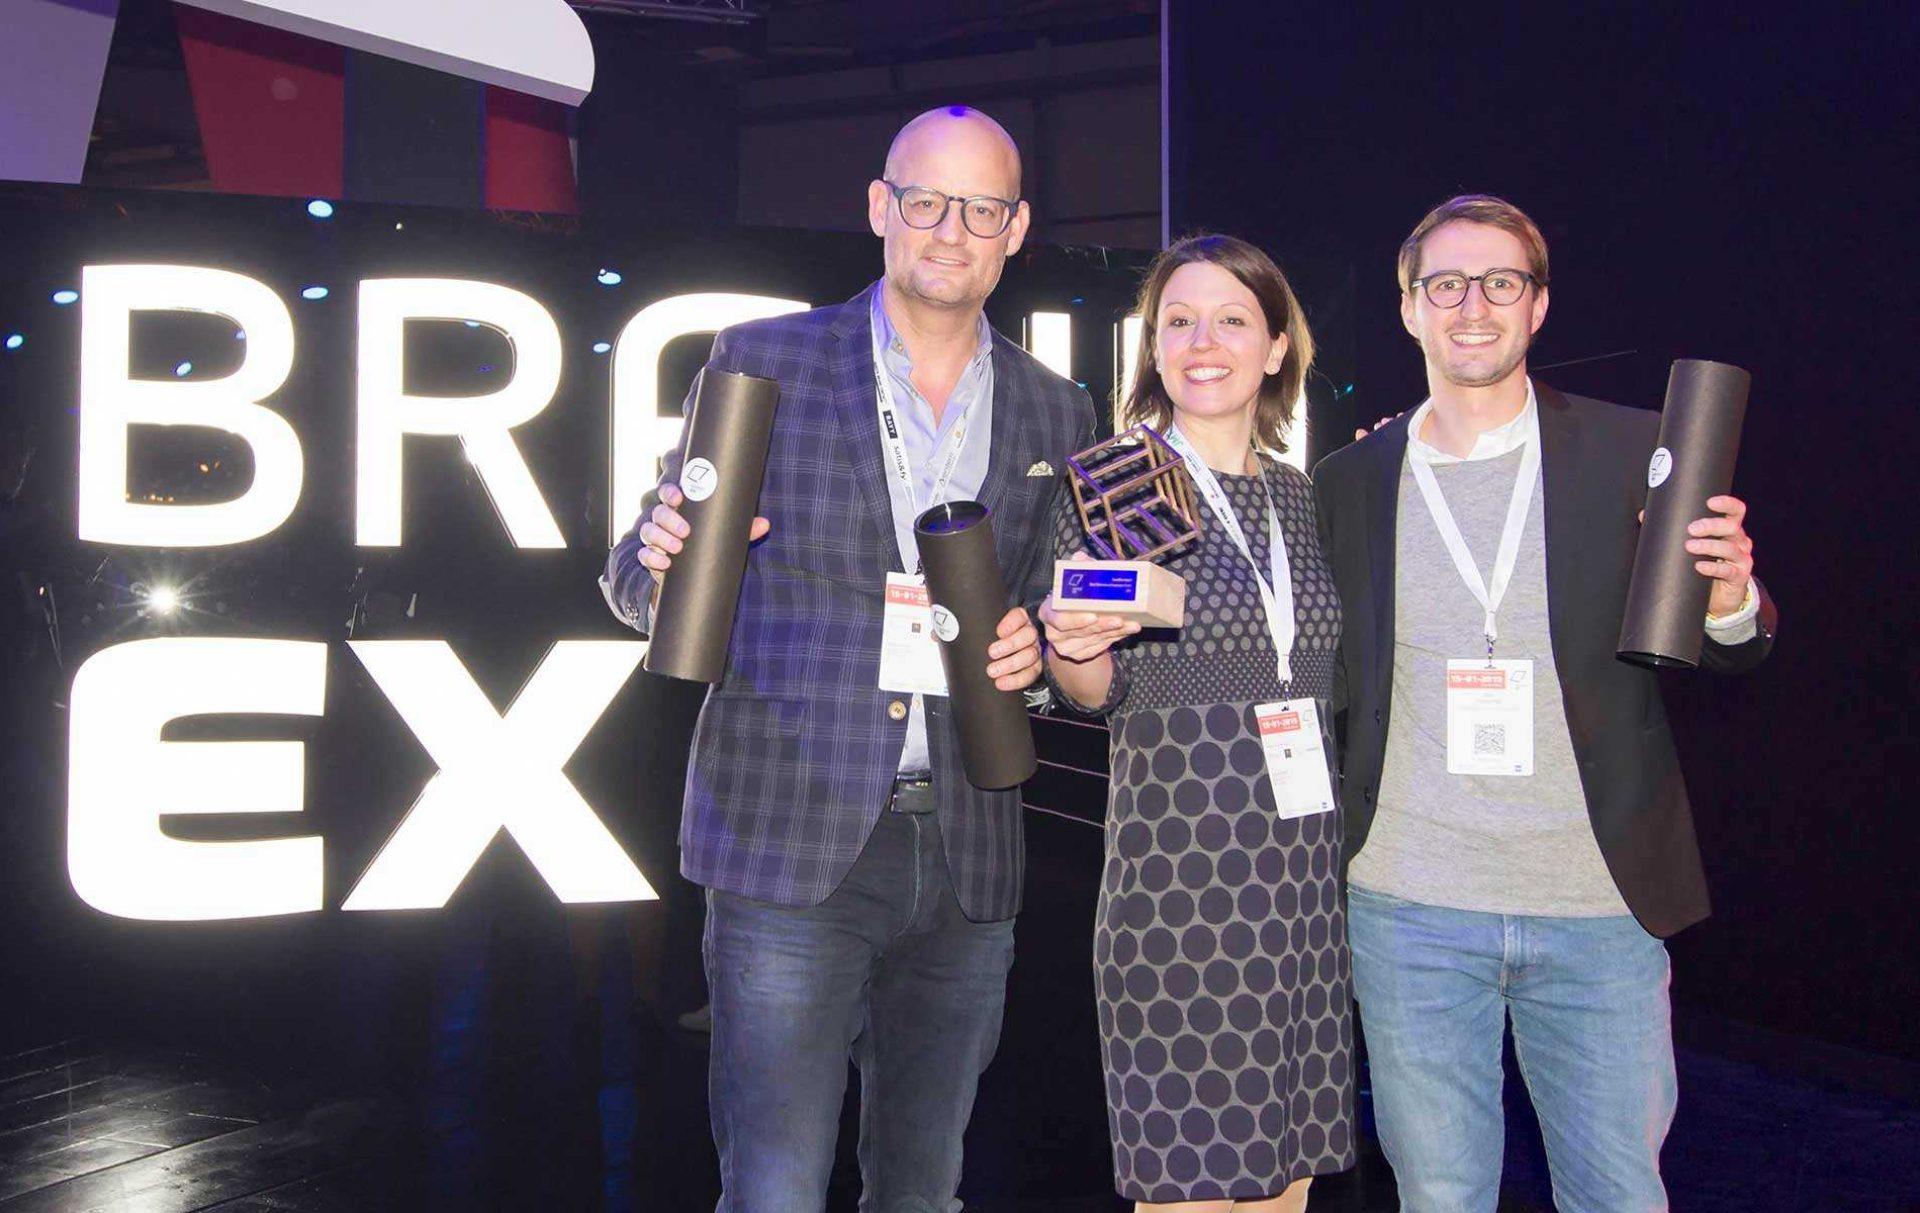 brandex award 2019